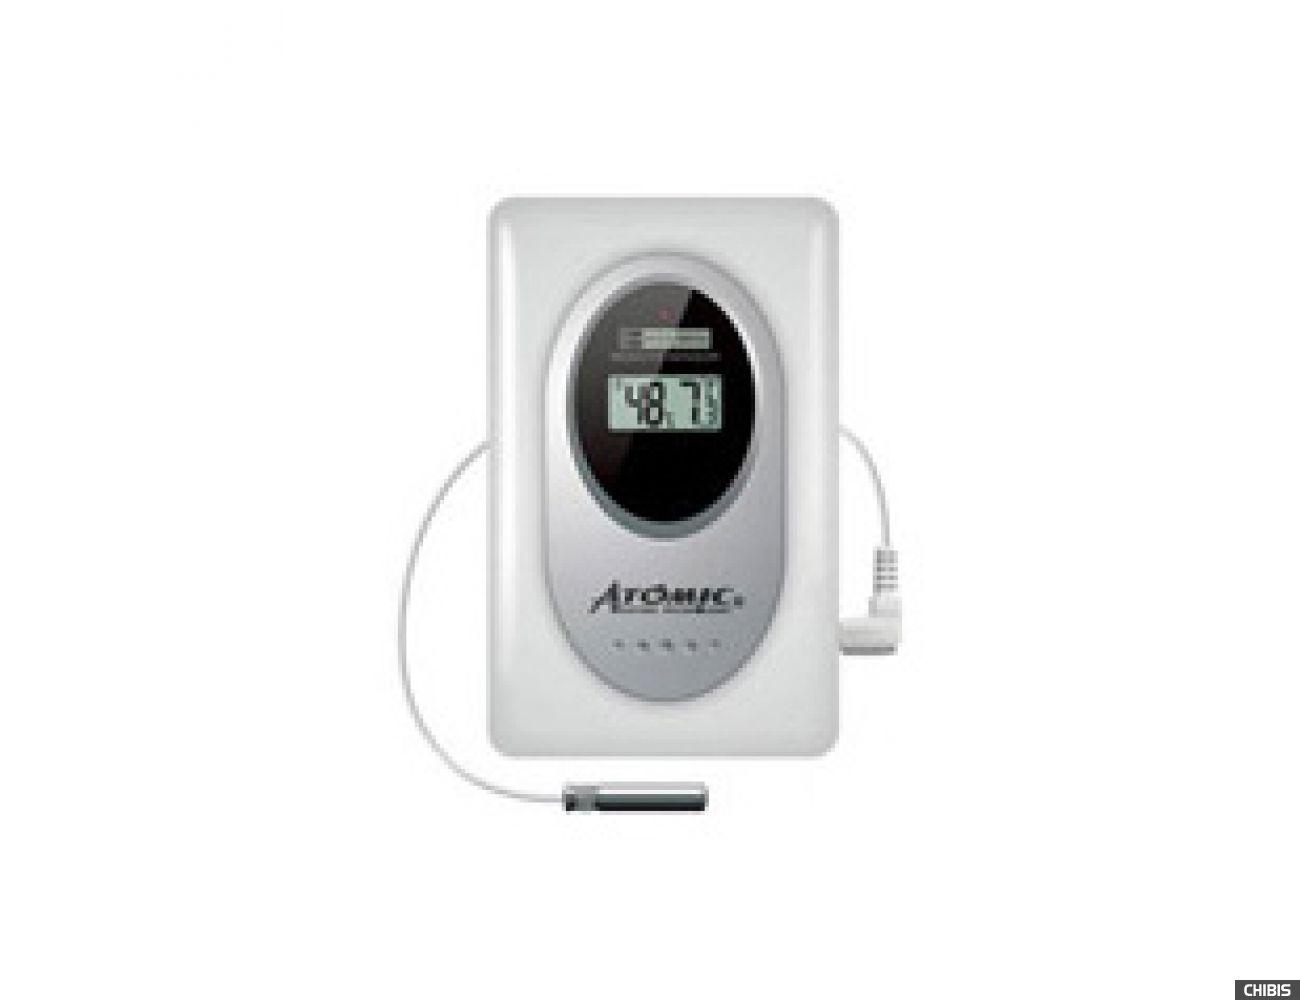 Датчик ATOMIC W339010-H